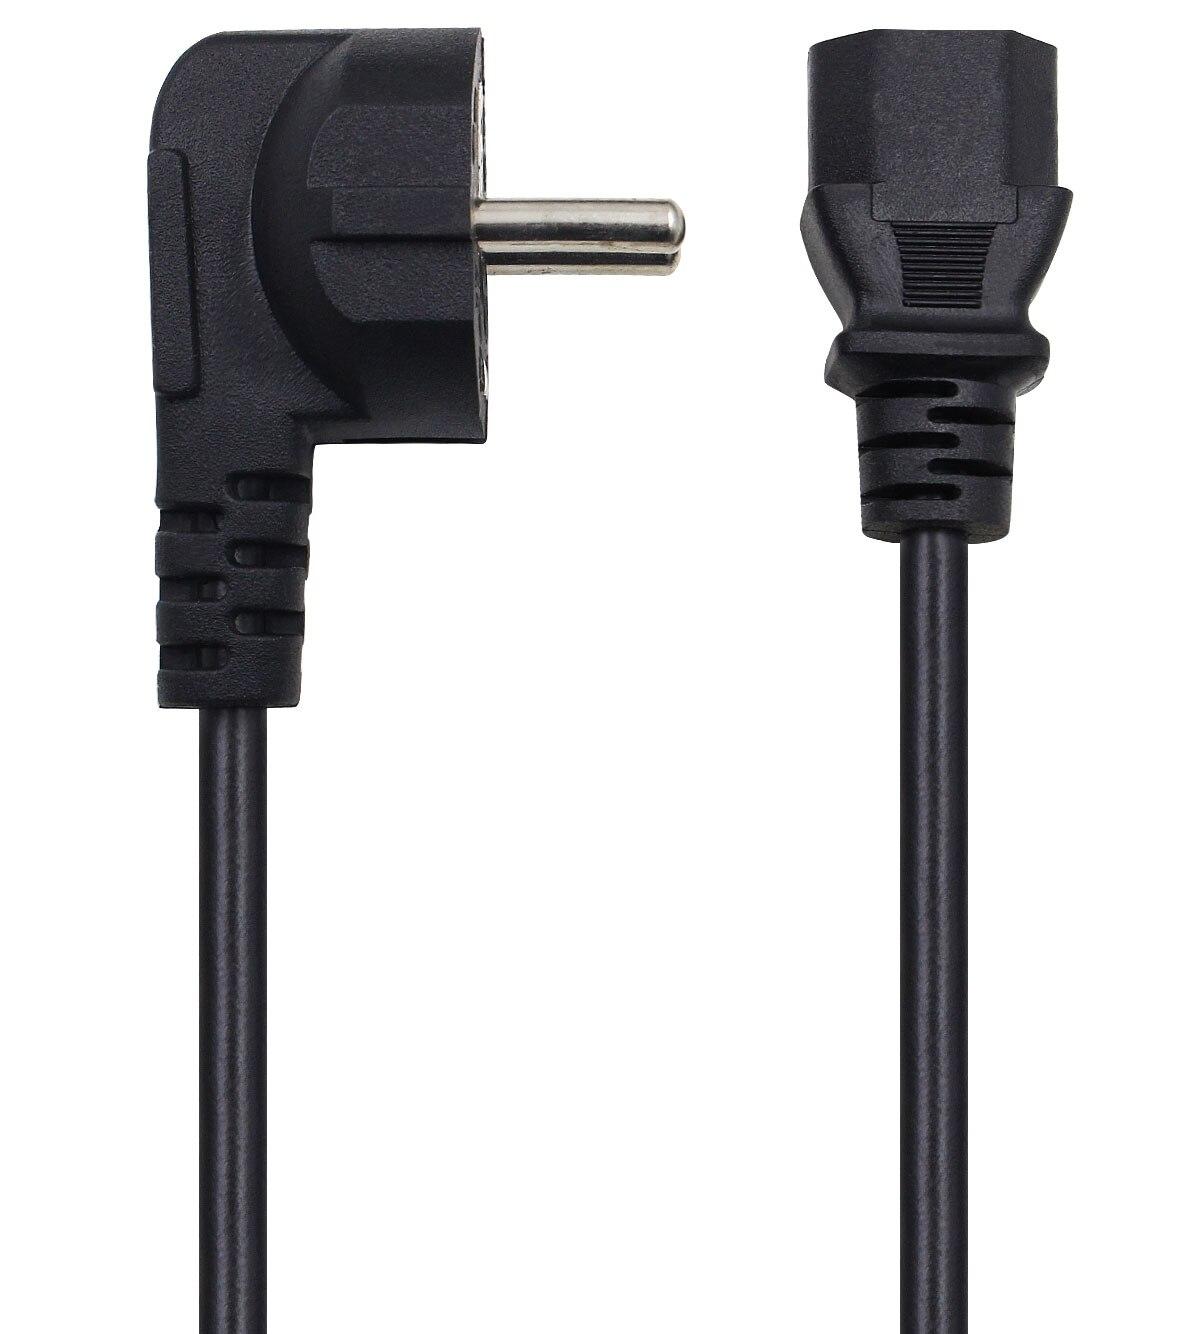 3 PRONG AC POWER CABLE CORD FOR VIZIO LG SAMSUNG PANASONIC TV LCD PLASMA HDTV